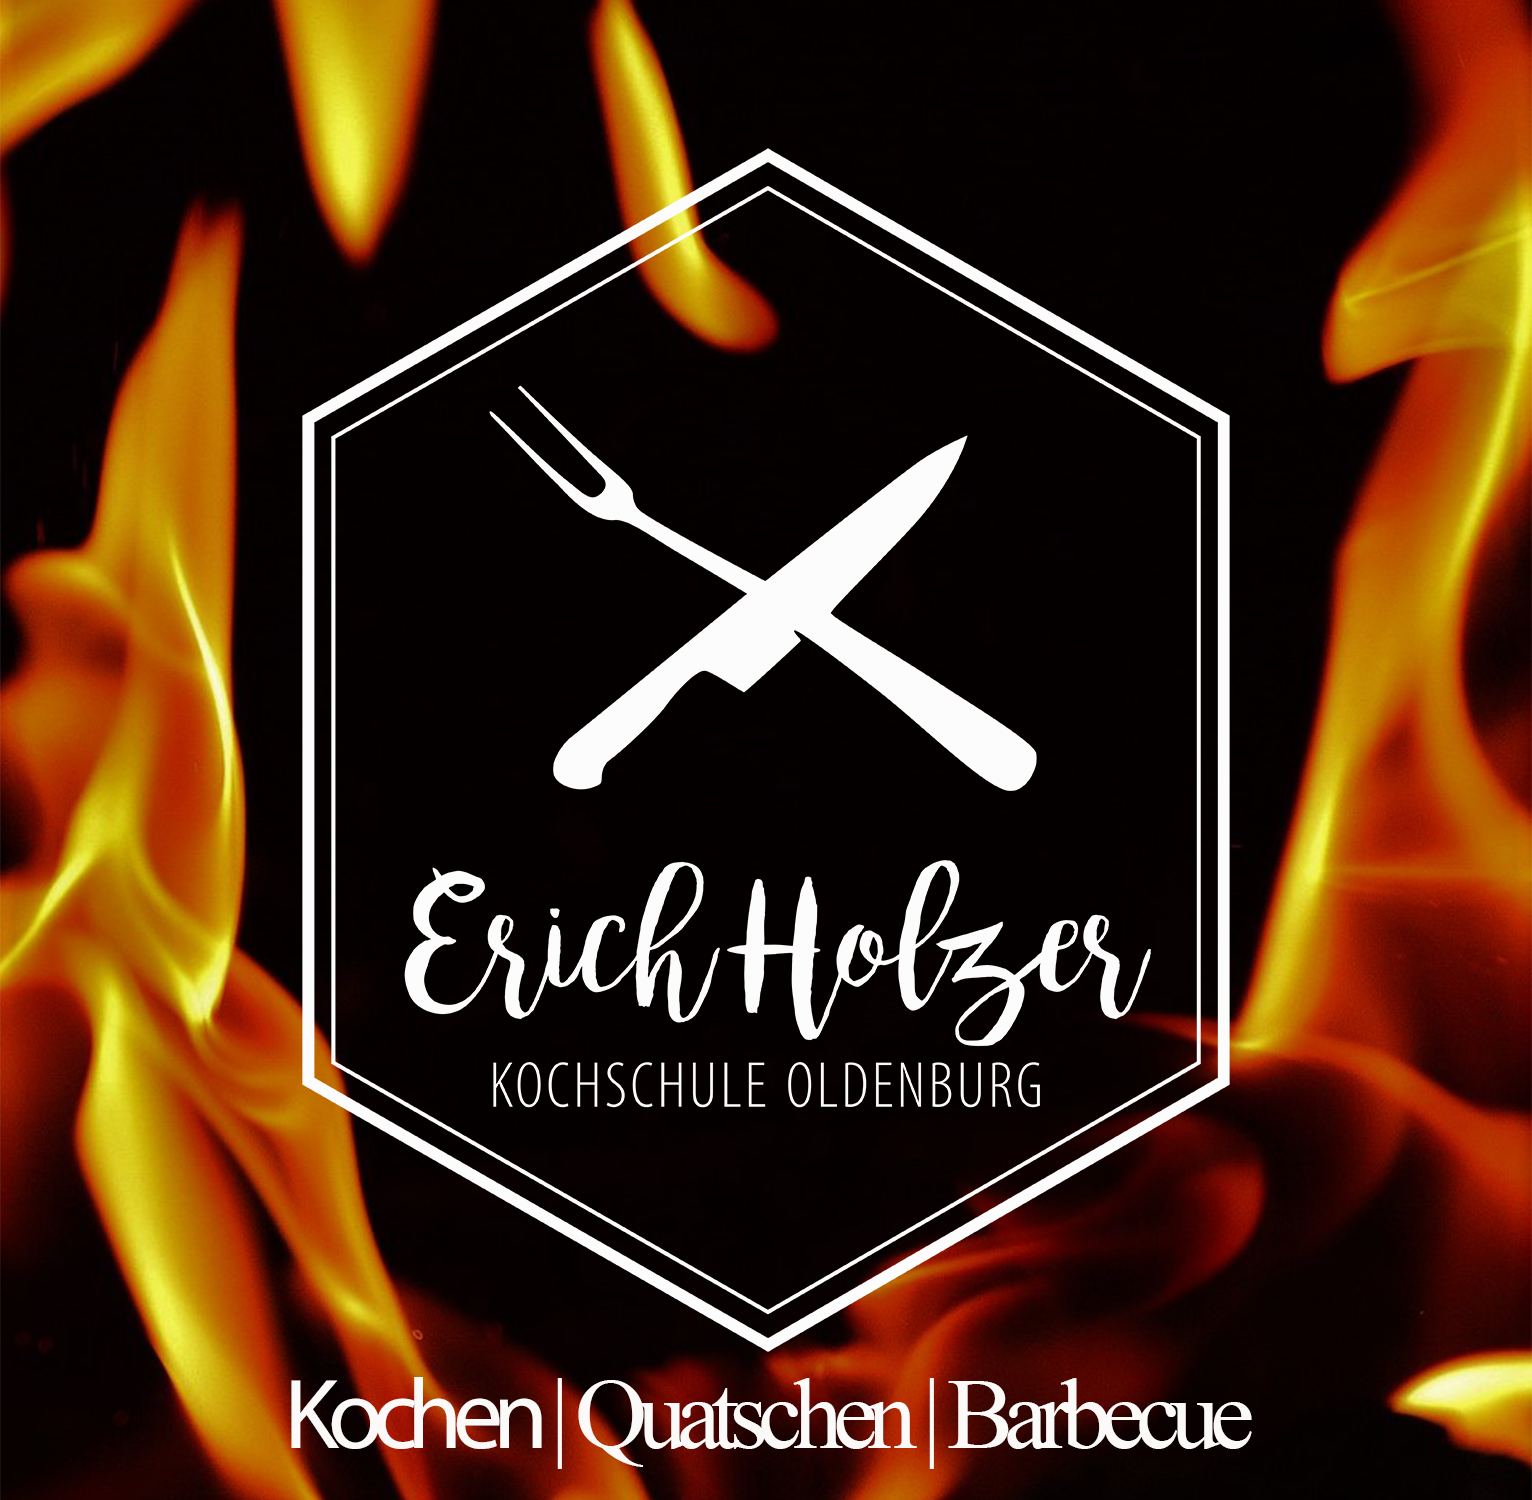 Kochschule Erich Holzer